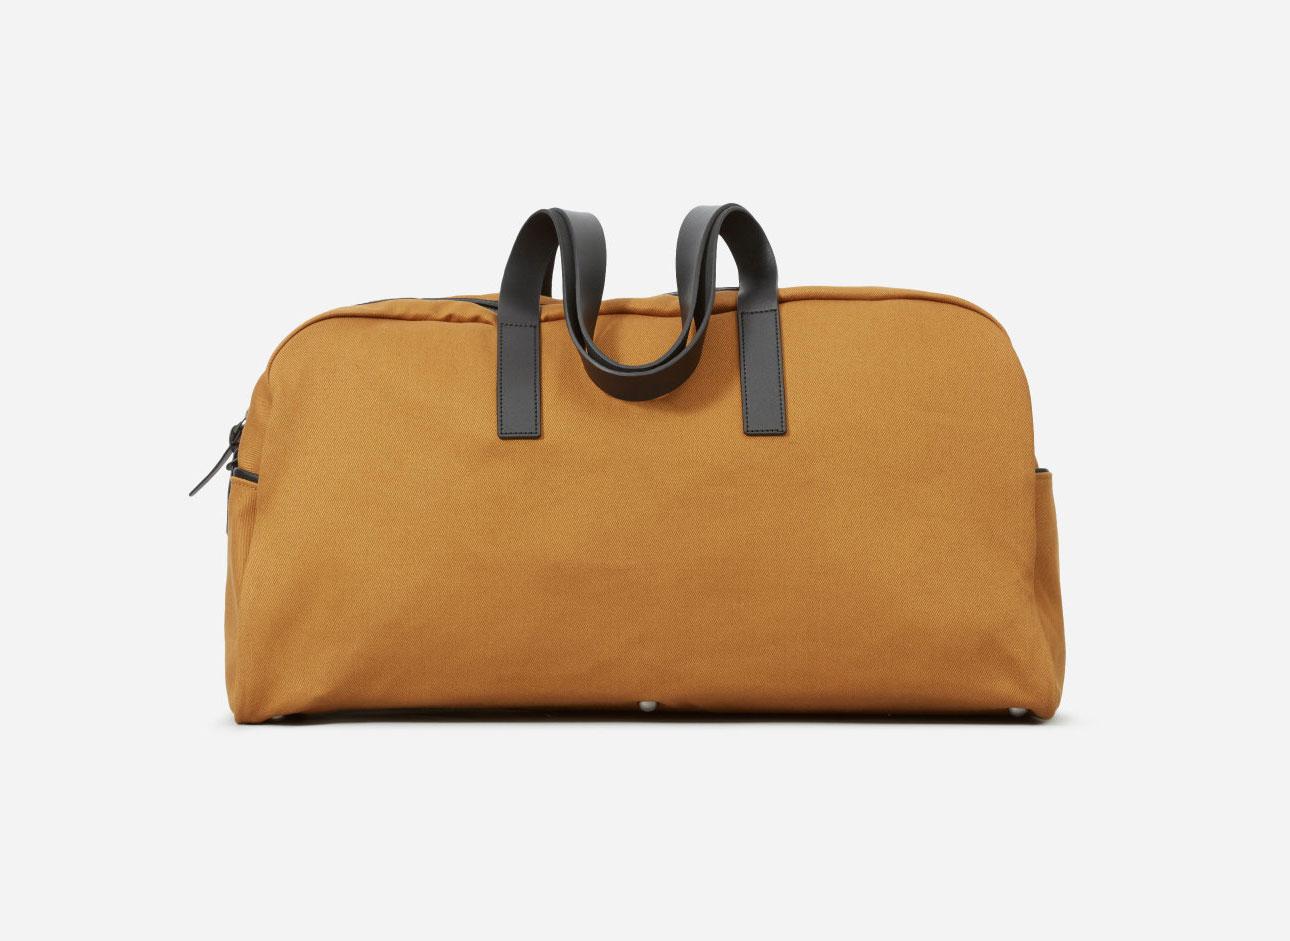 Everlane The Twill Weekender bag